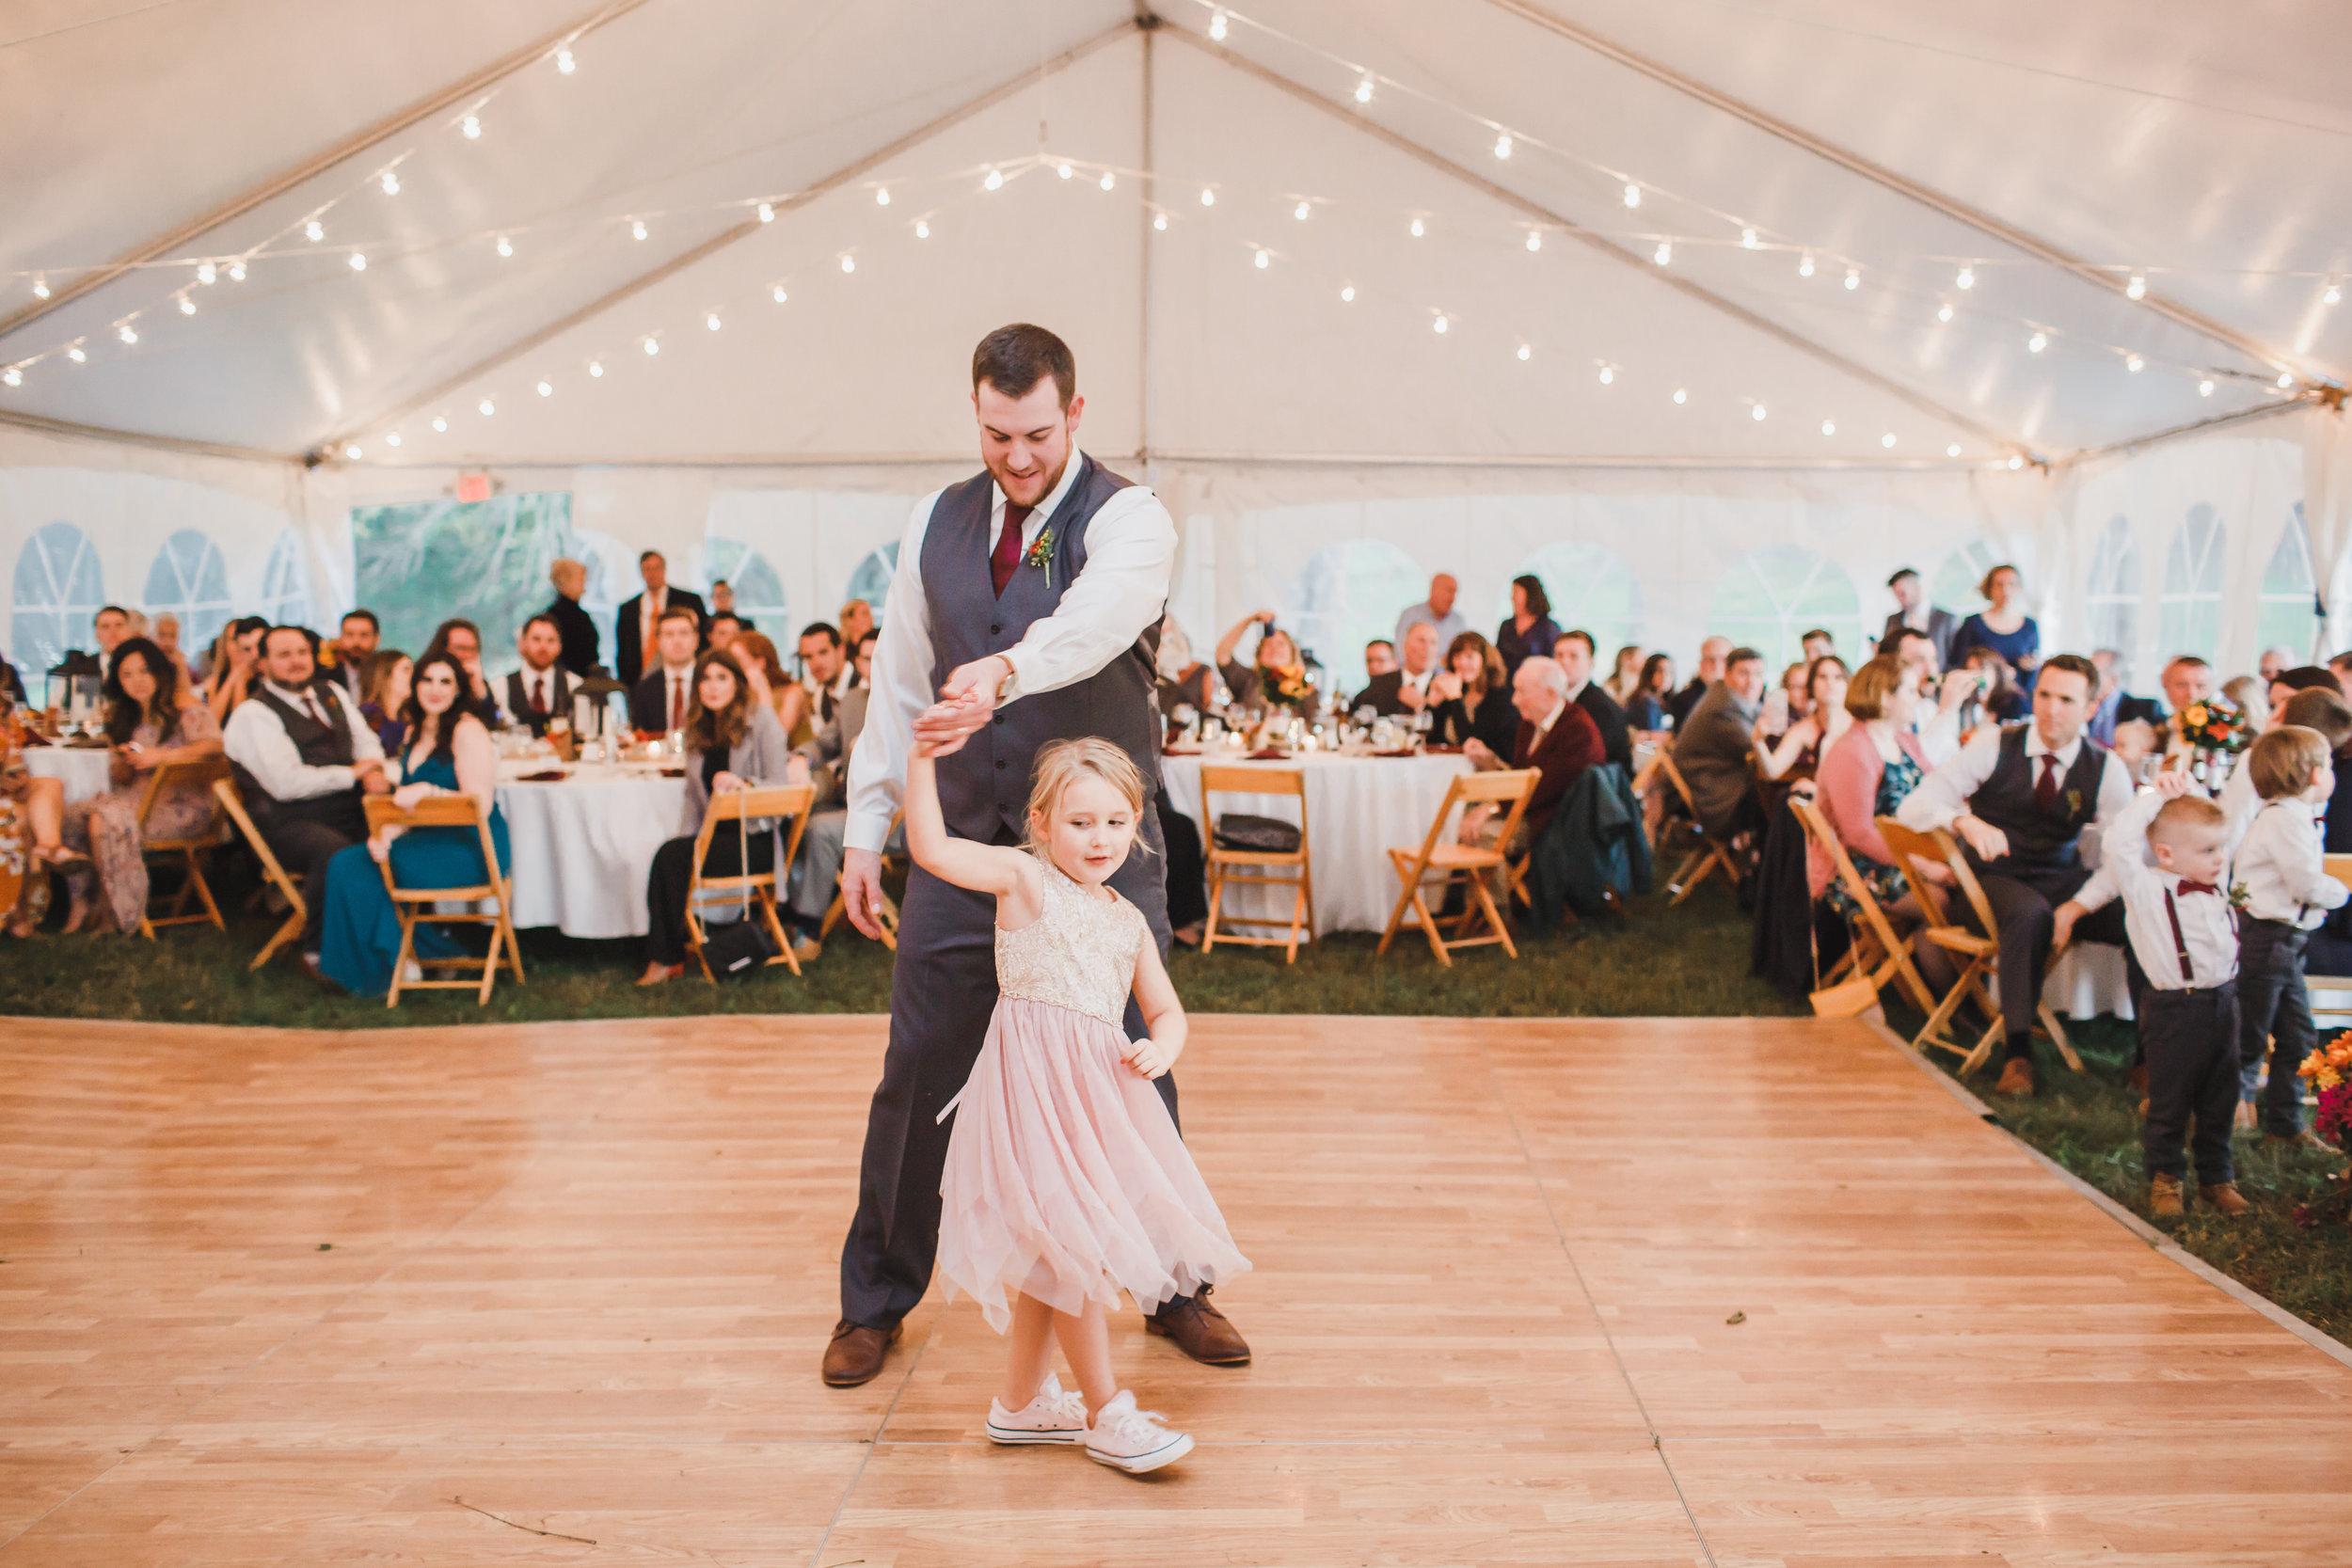 Fling - Virginia Wedding Photographer - Photography by Amy Nicole-4623-3.jpg